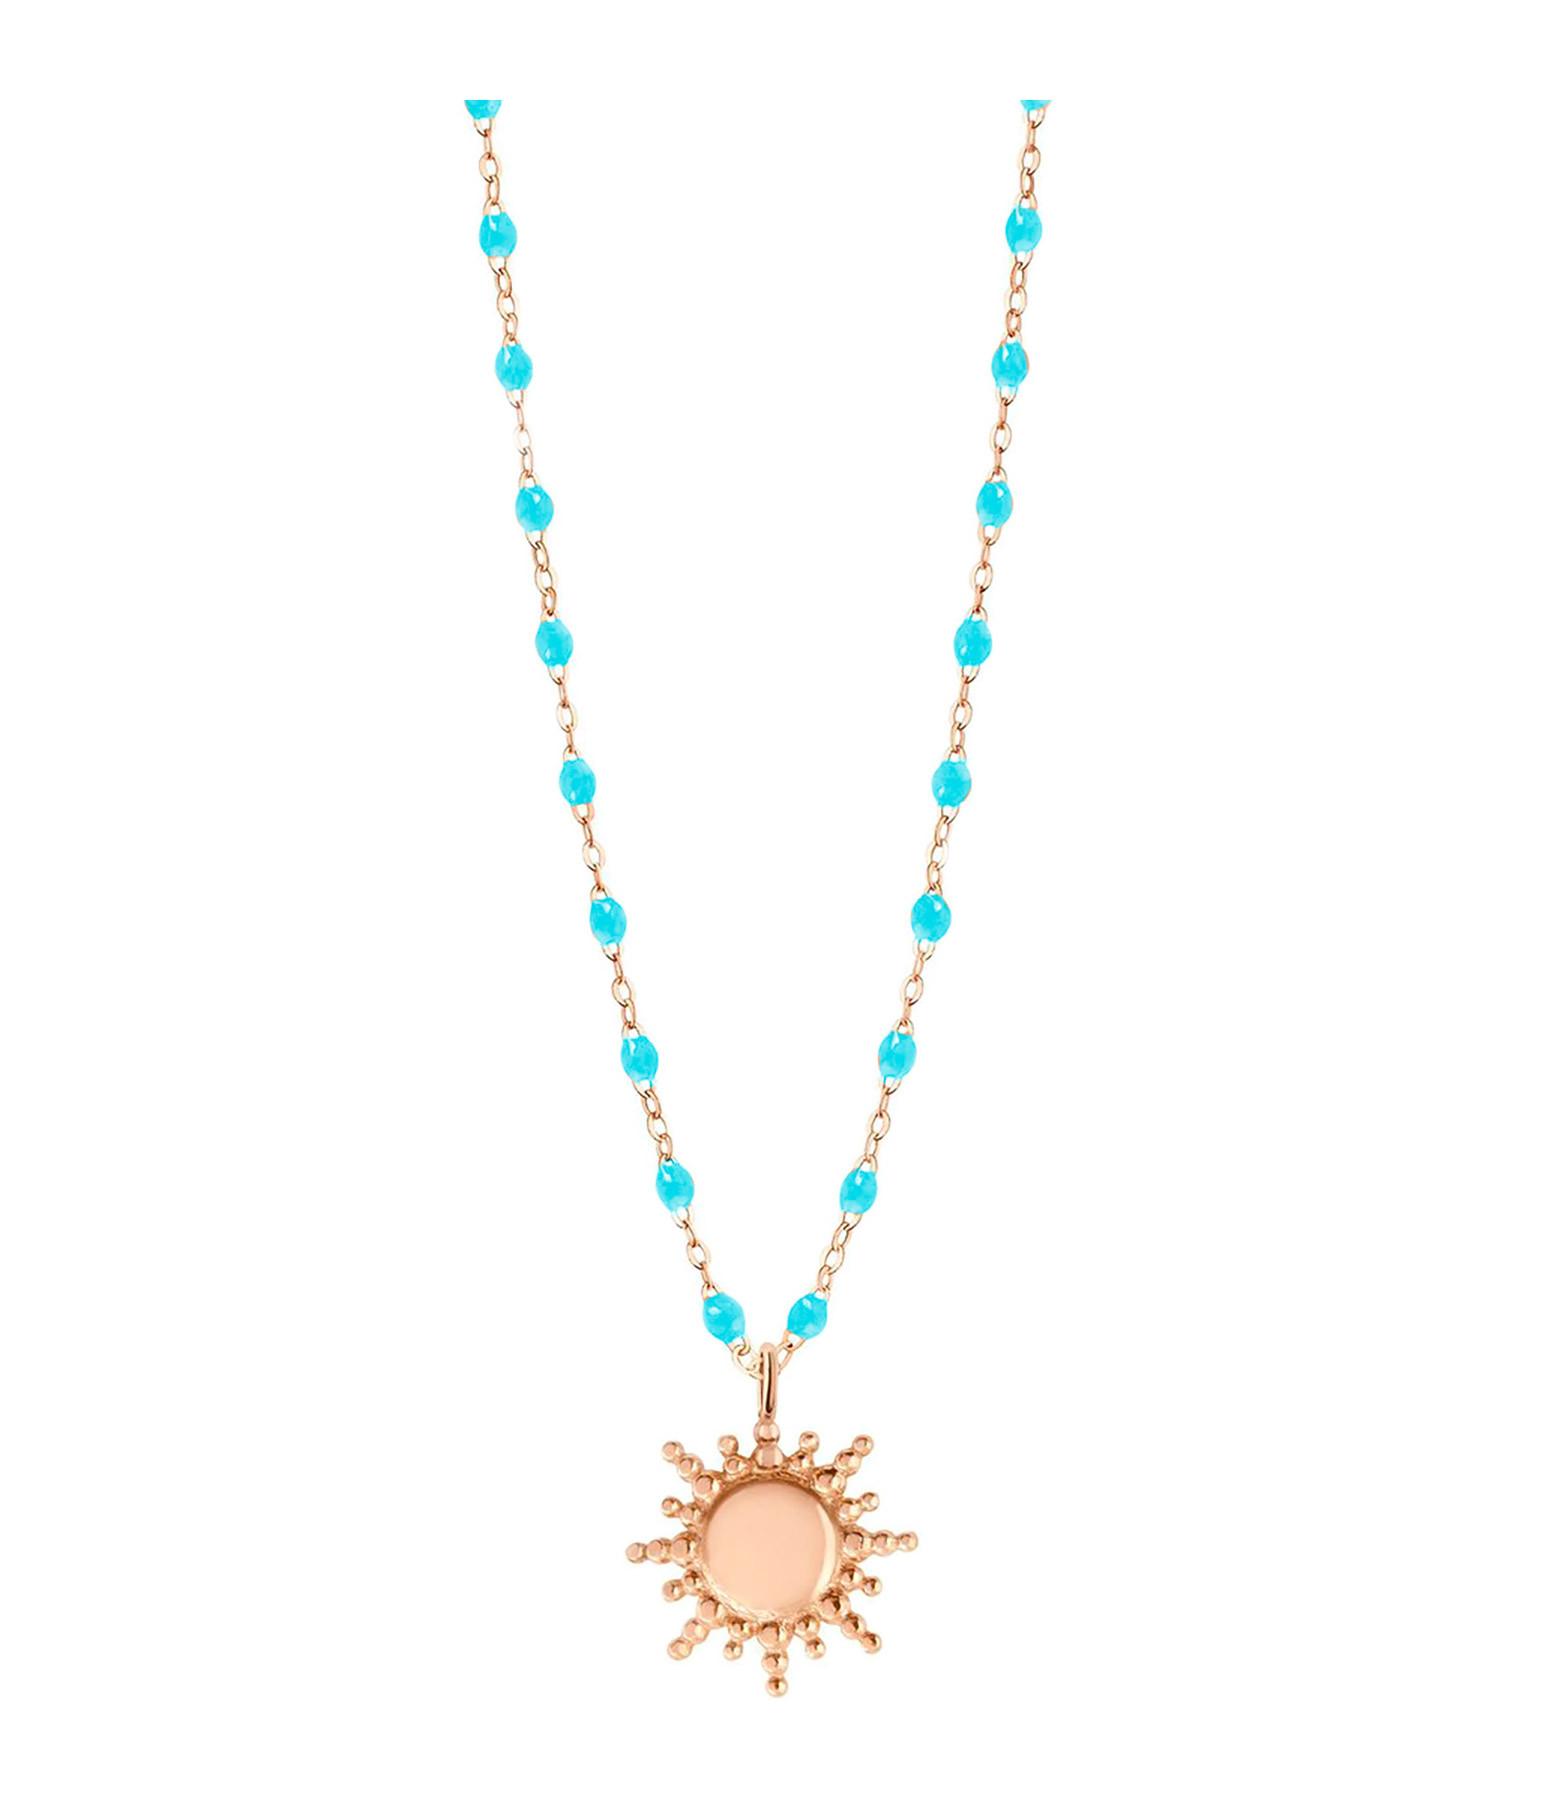 GIGI CLOZEAU - Collier Mini Perles Résine Soleil